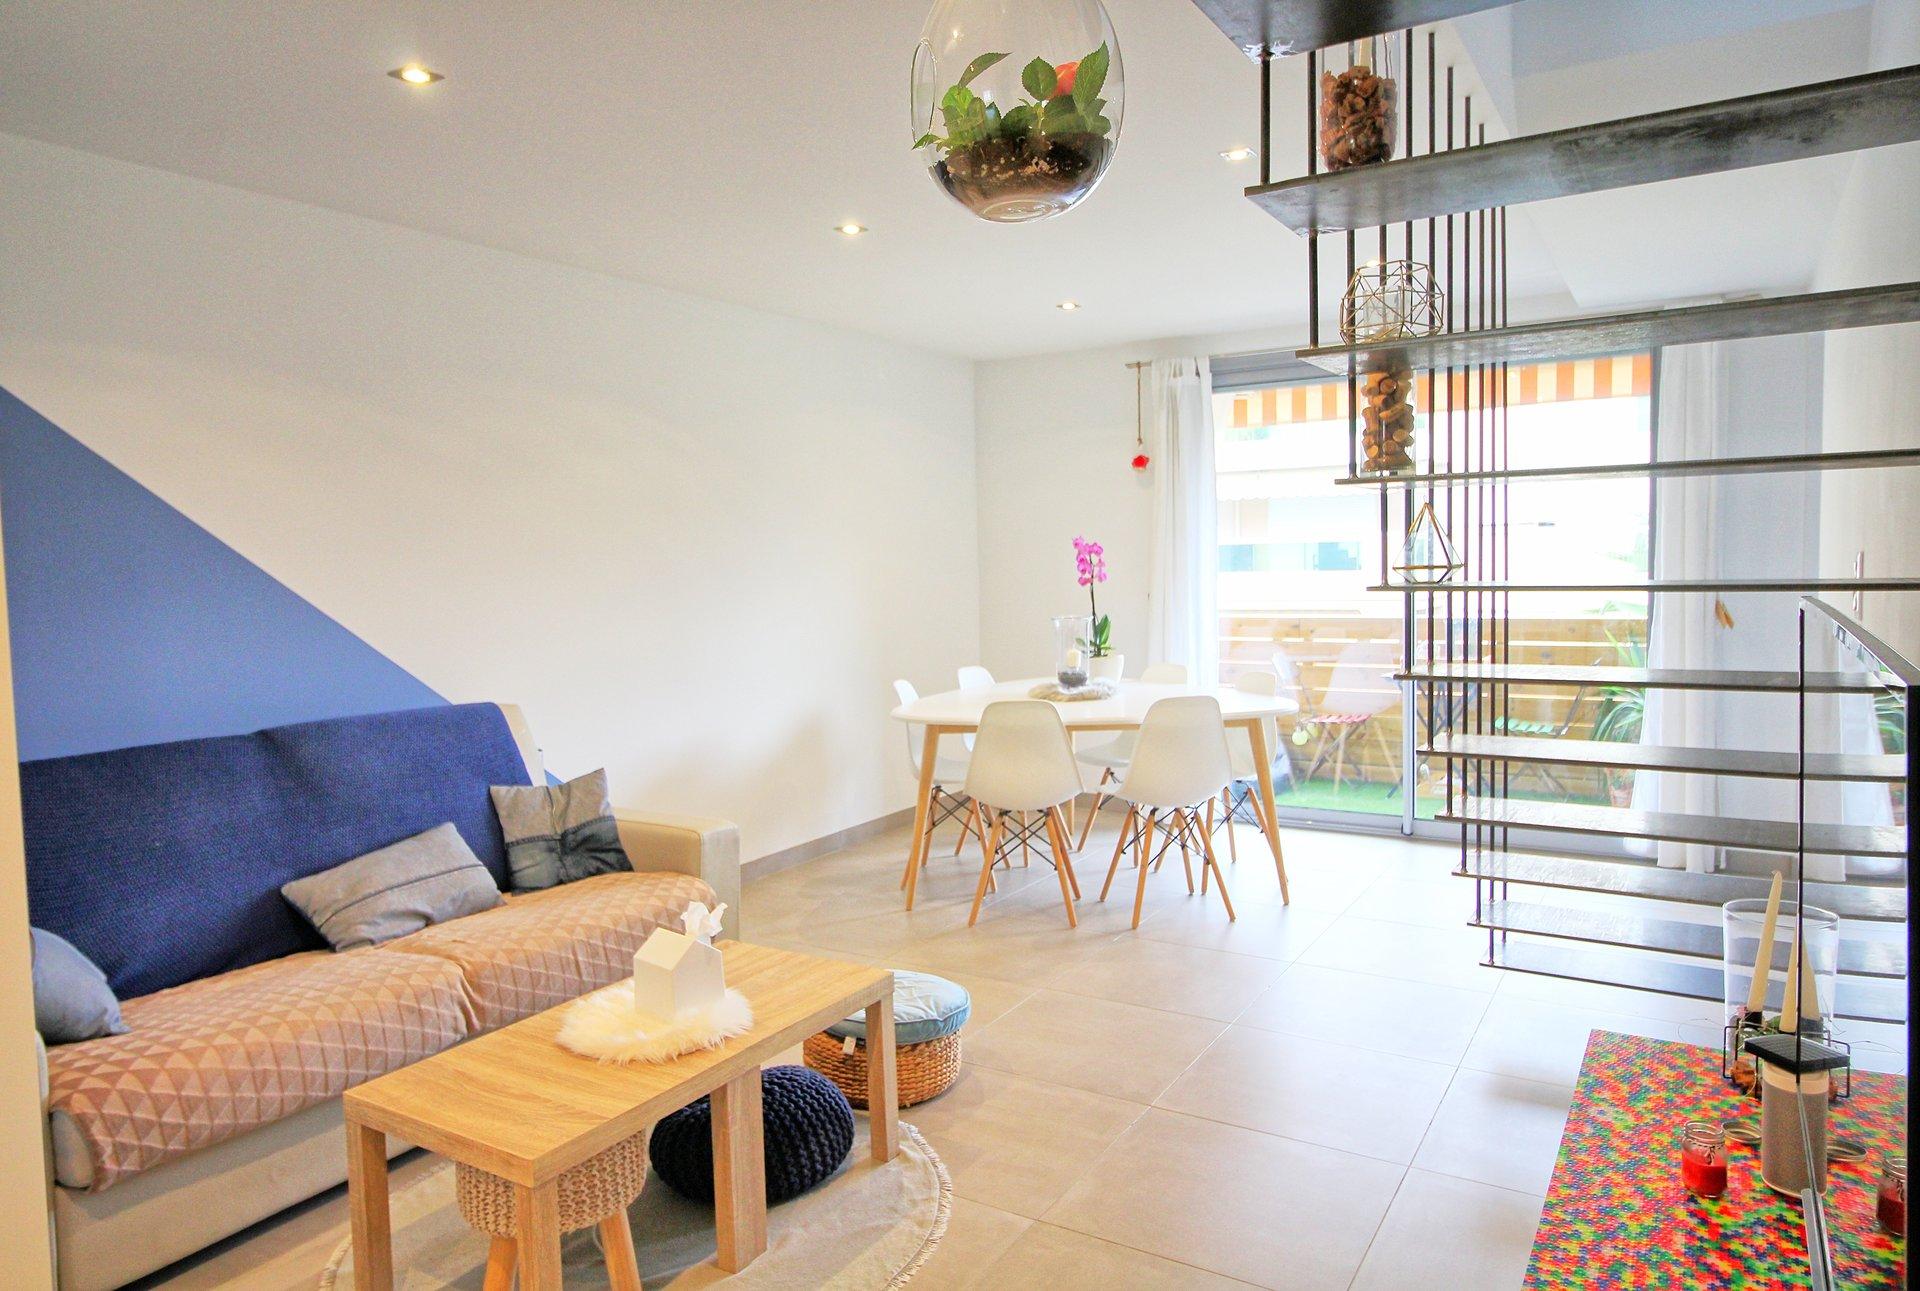 T3, Vespins, st laurent, terrasse, parking,appartement